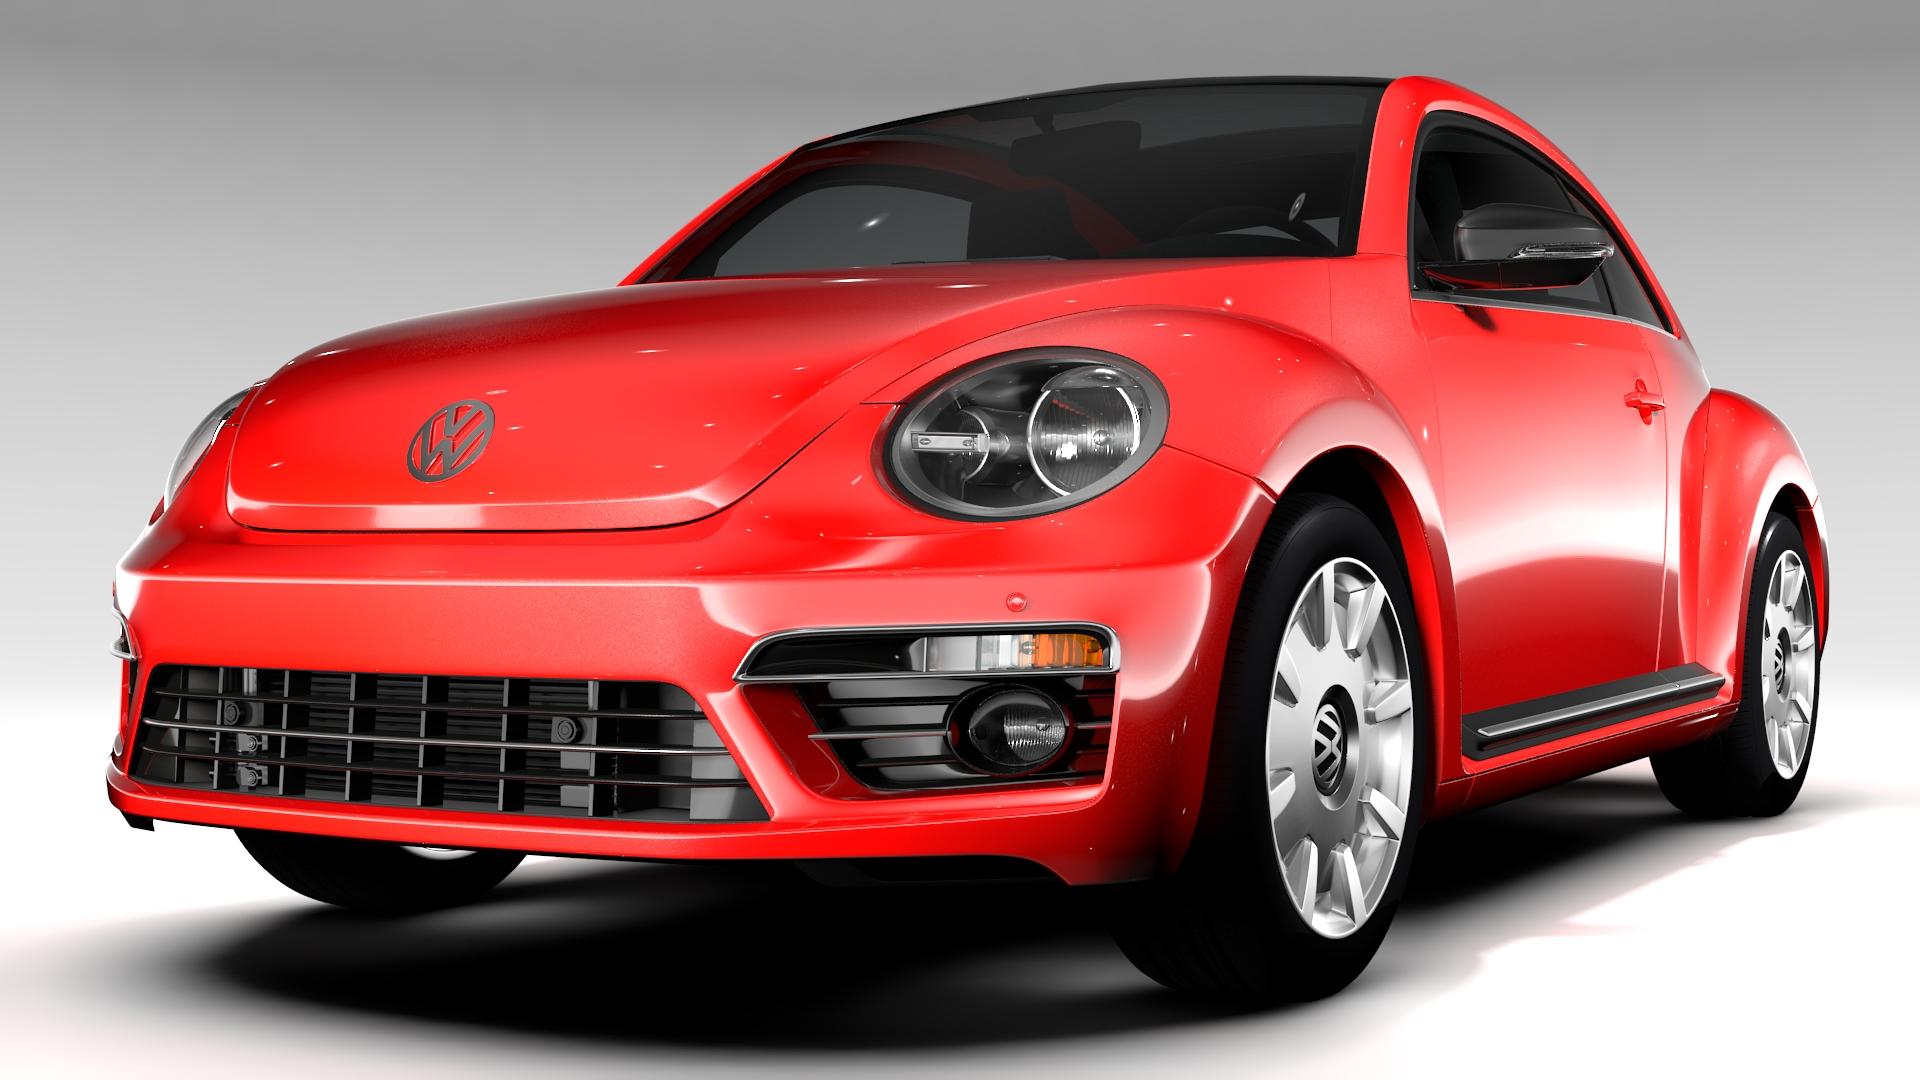 vw beetle turbo 2017 3d model 3ds max fbx c4d lwo ma mb hrc xsi obj 221658